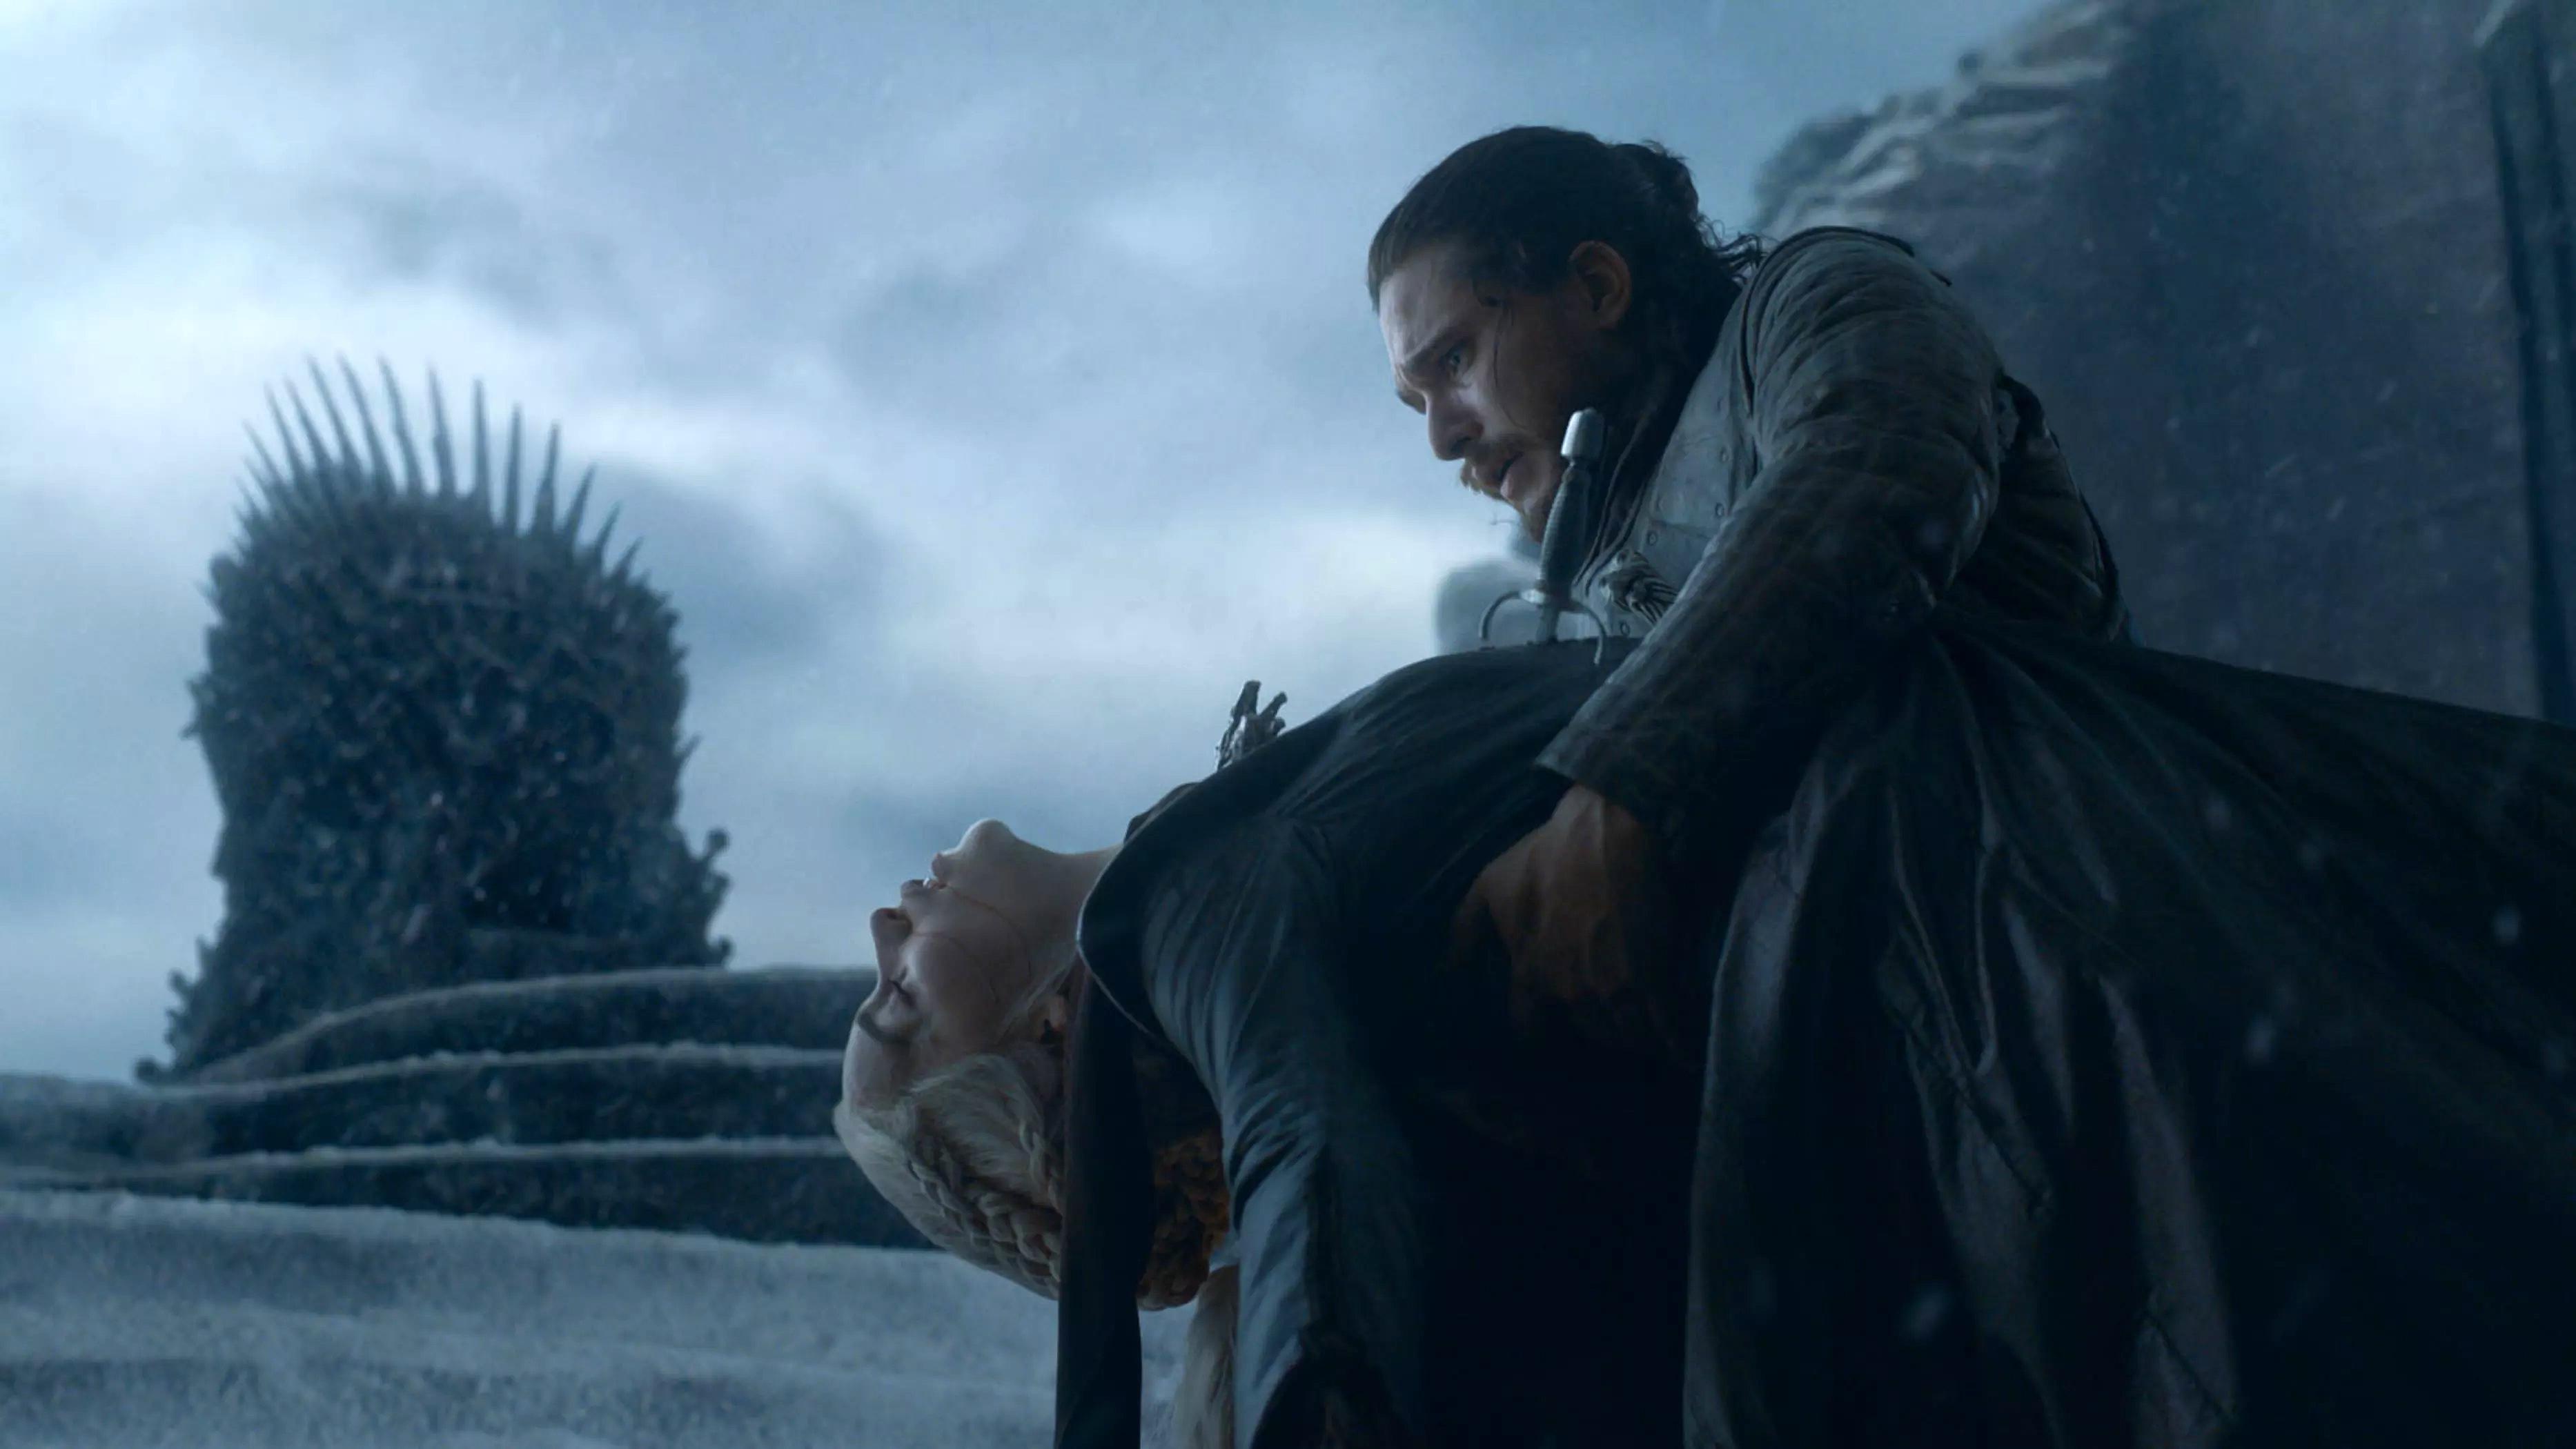 8x06 - The Iron trono - Daenerys and Jon